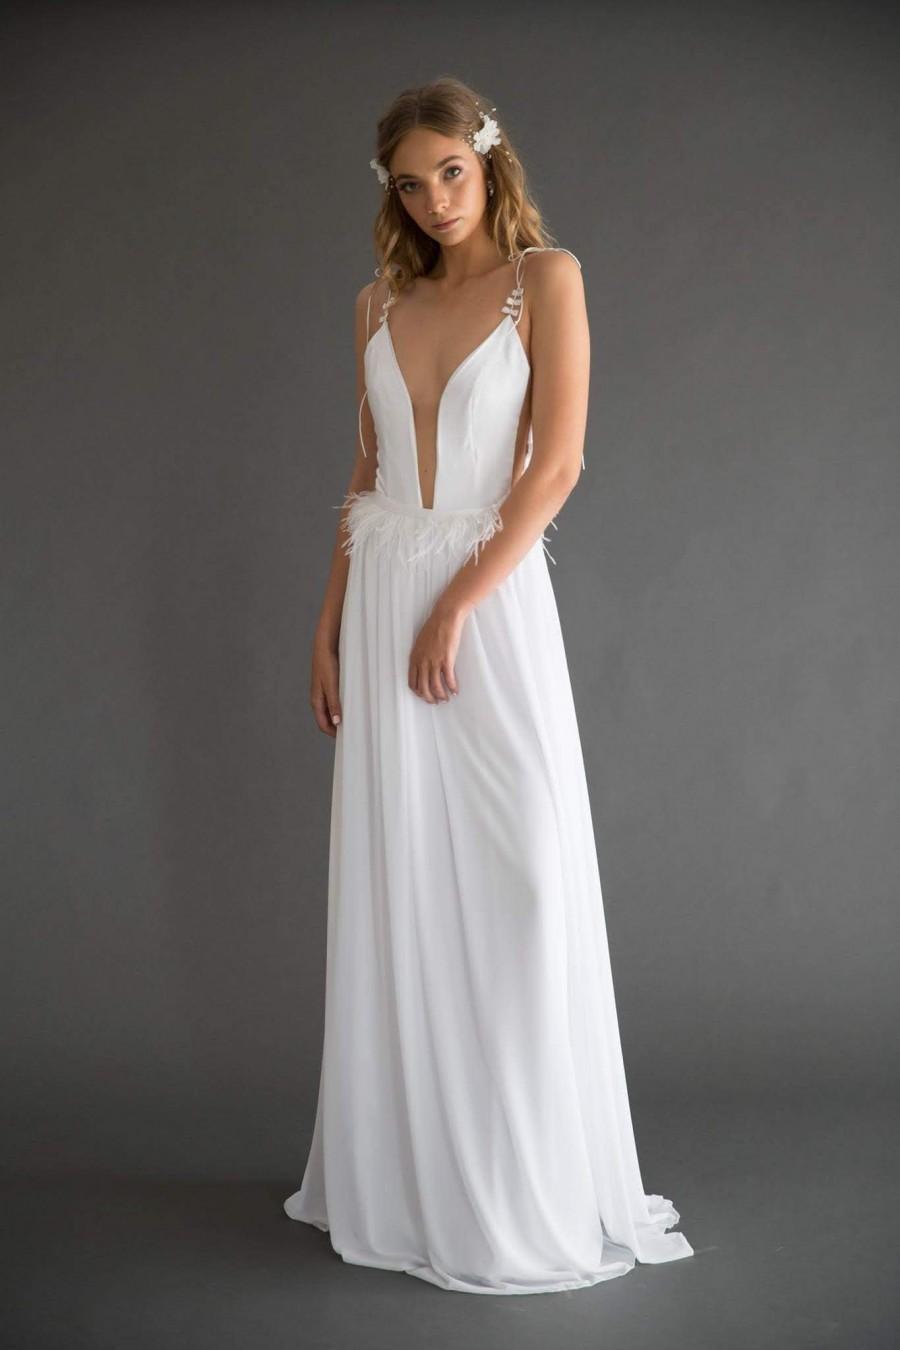 Wedding - White Bridal Hair Comb, Bridal Flower Comb, Bridal Hair Flowers, Bridal Hair Piece, Wedding Hair Flowers, Wedding Flower Hair Comb